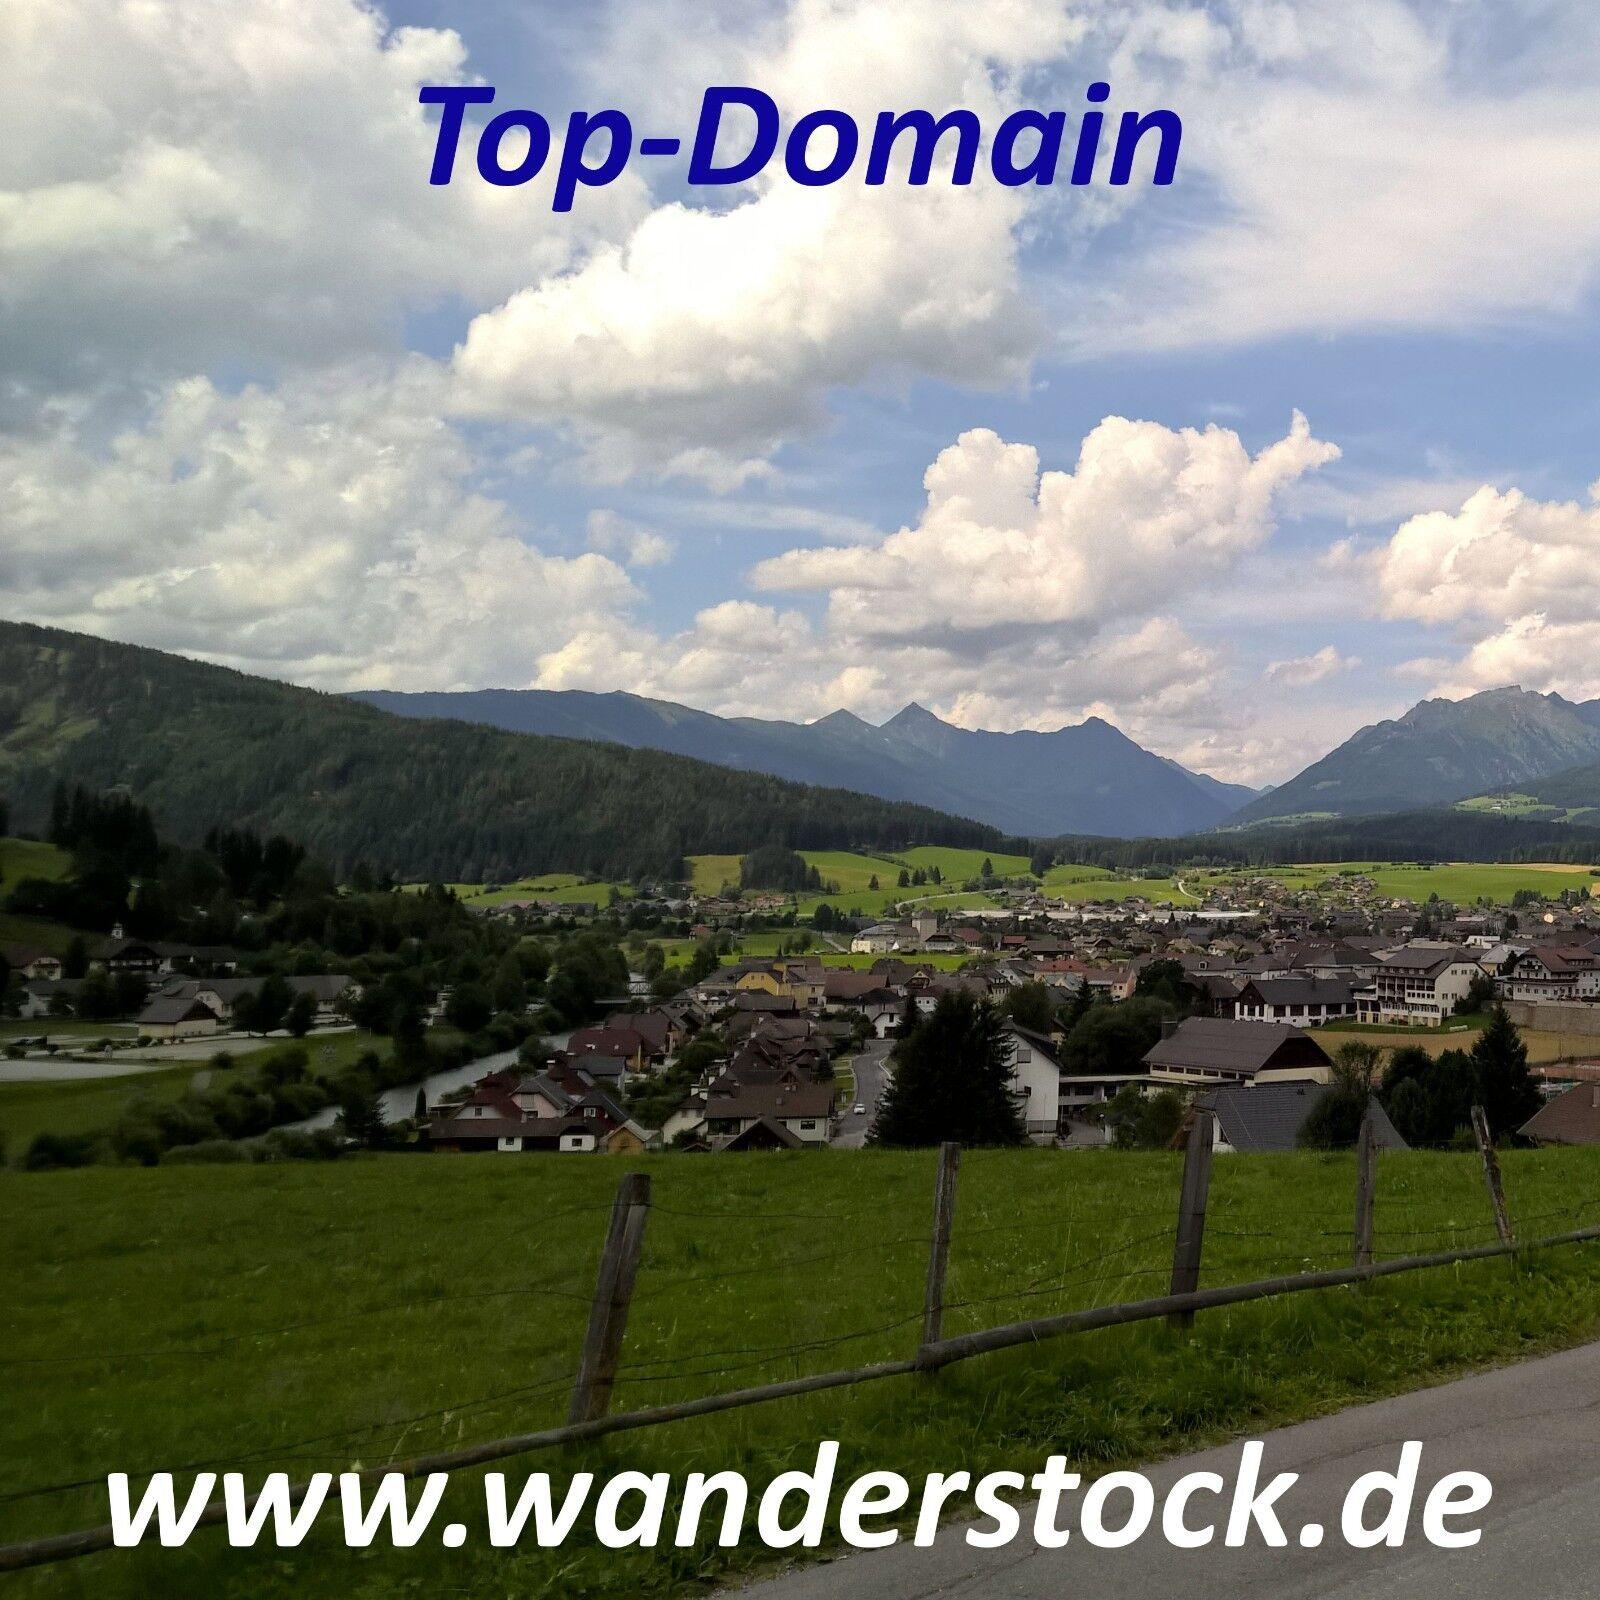 www.wanderstock.de - Top Keyword Domain - Preis verhandelbar